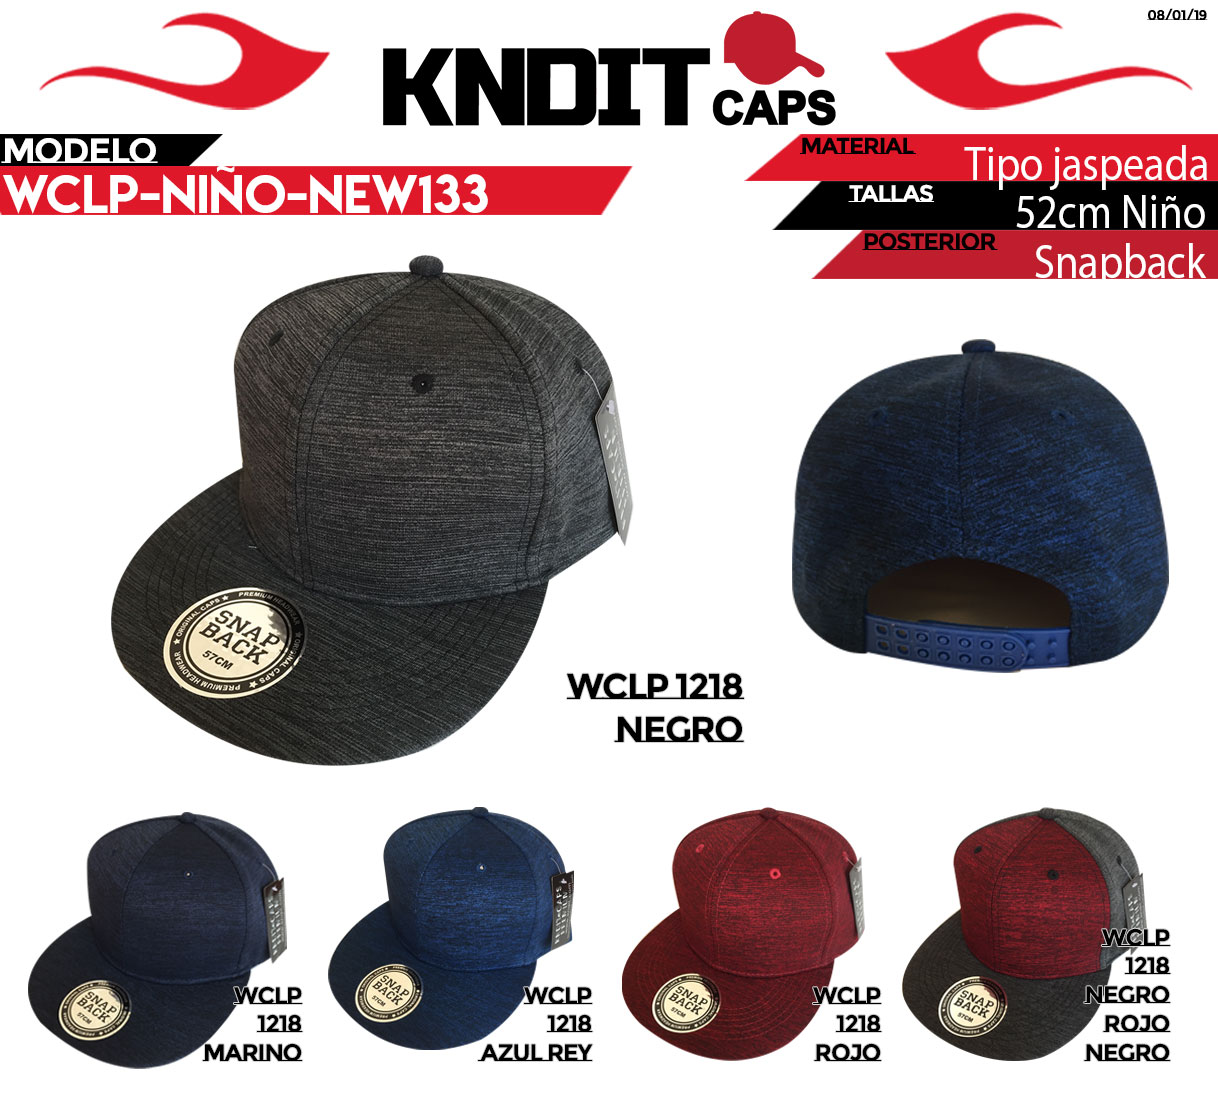 WCLP-1218-NEW133